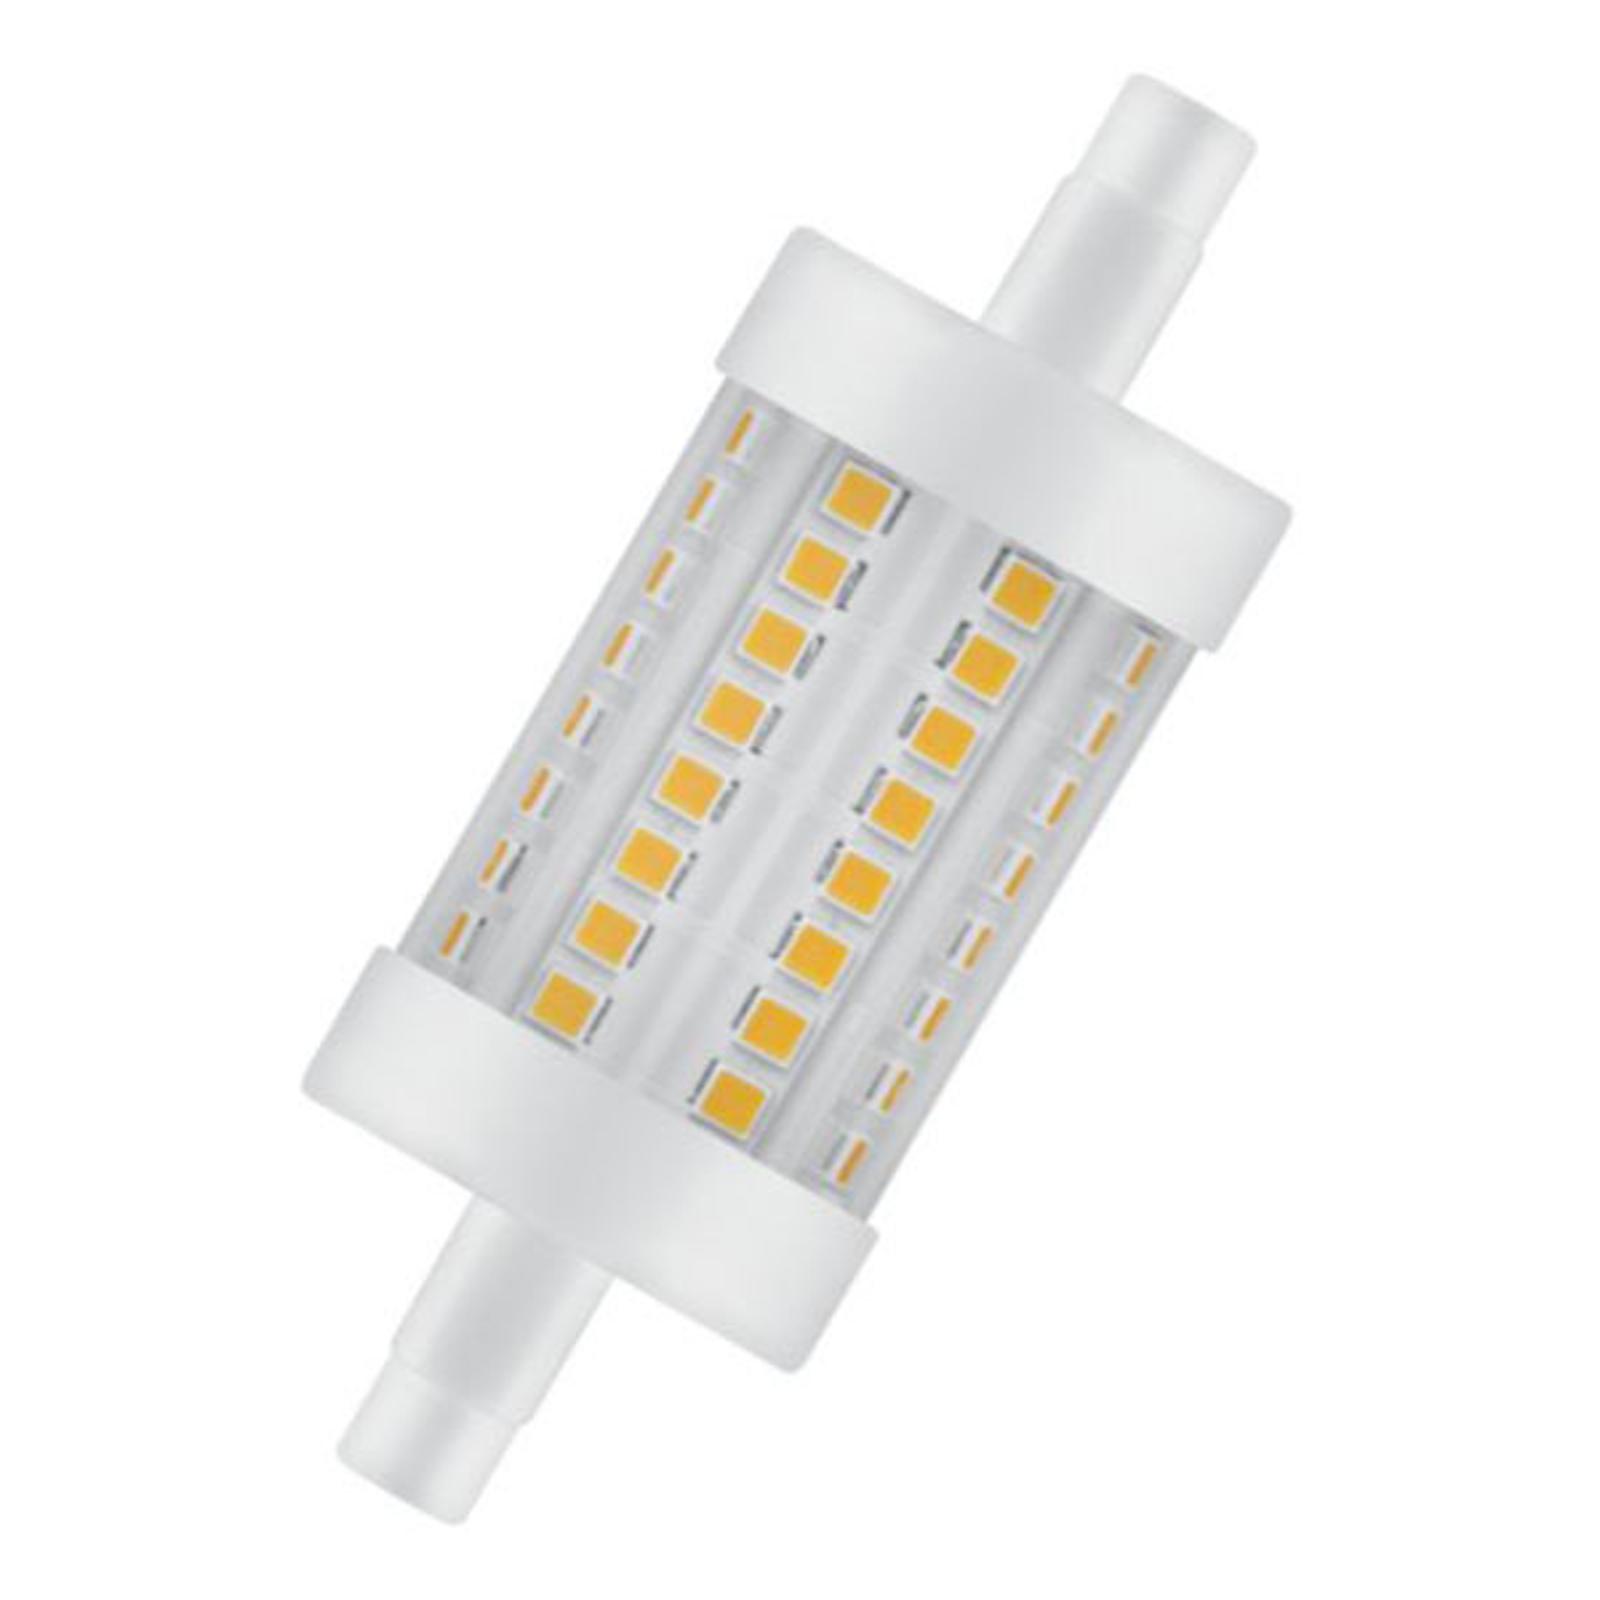 OSRAM LED-pære R7s 7W 2700K